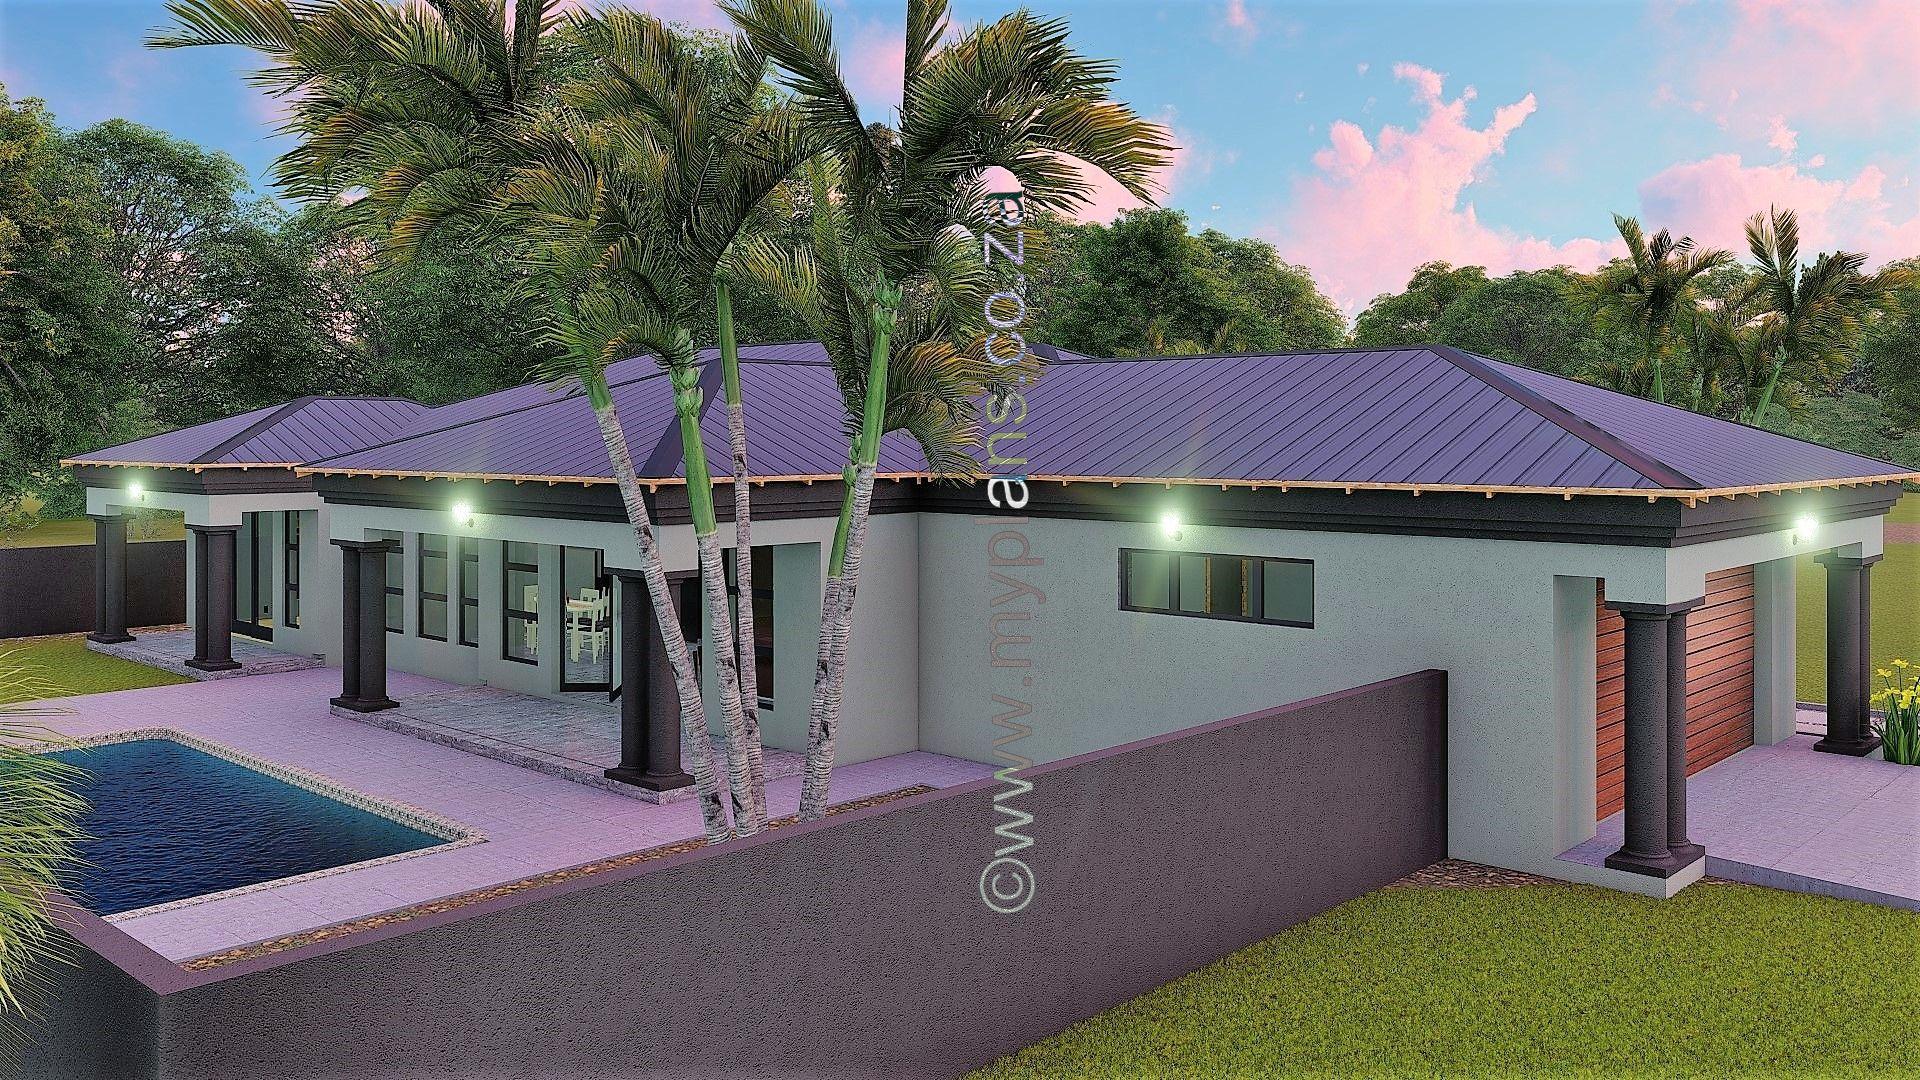 3 Bedroom House Plan Bla 074s My Building Plans South Africa House Plans South Africa Bedroom House Plans Bungalow House Design